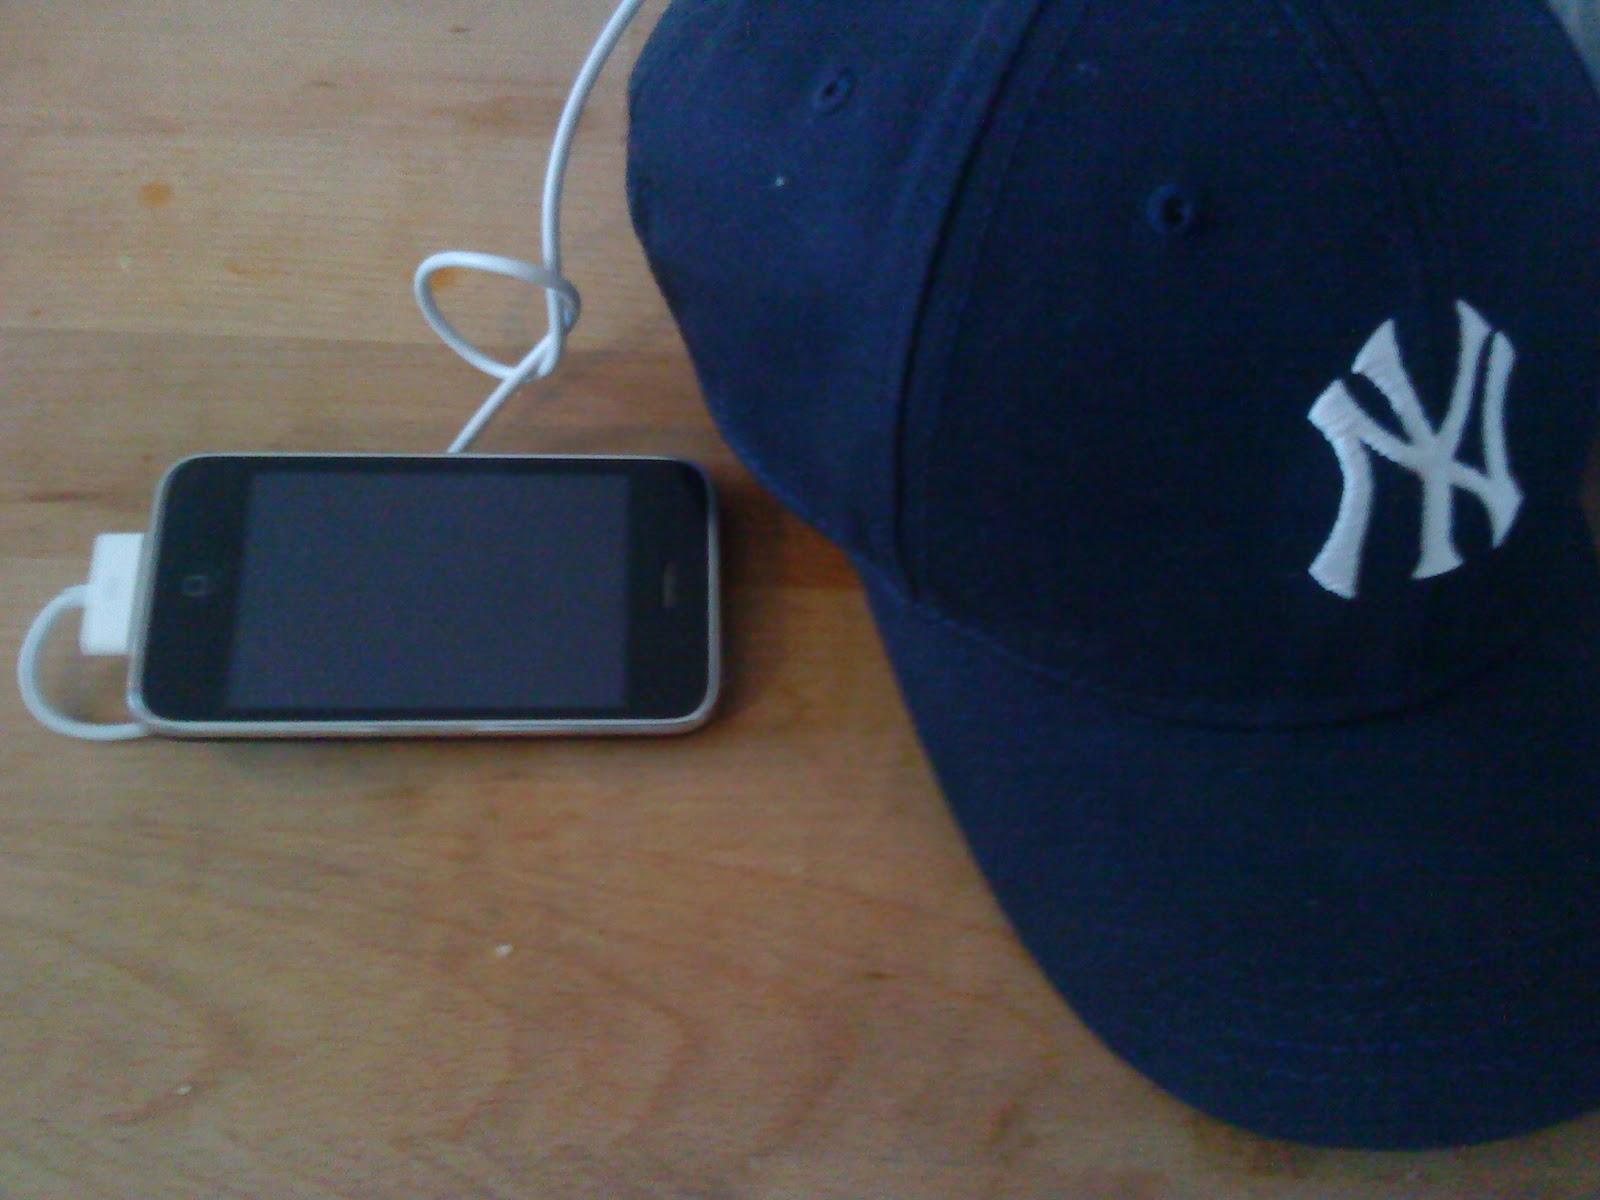 http://2.bp.blogspot.com/_GoZQkJw1hdE/TNXQaqCV0RI/AAAAAAAAClE/7KxdTvuKf34/s1600/I+Phone.JPG